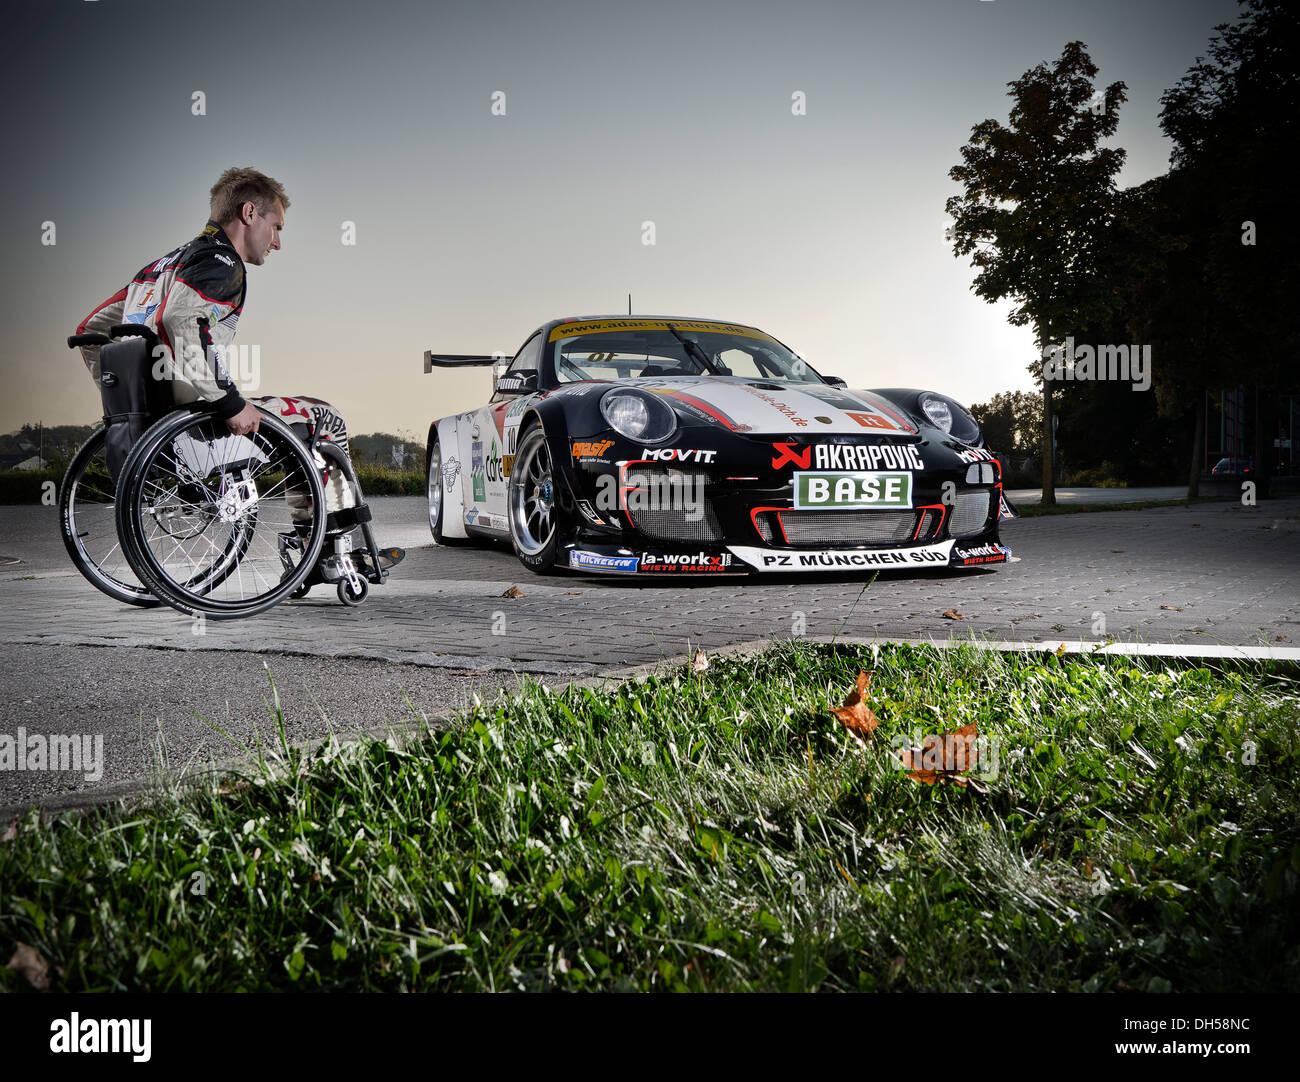 Race car driver in a wheelchair, next to his Porsche race car, Munich, Upper Bavaria, Bavaria, Germany - Stock Image